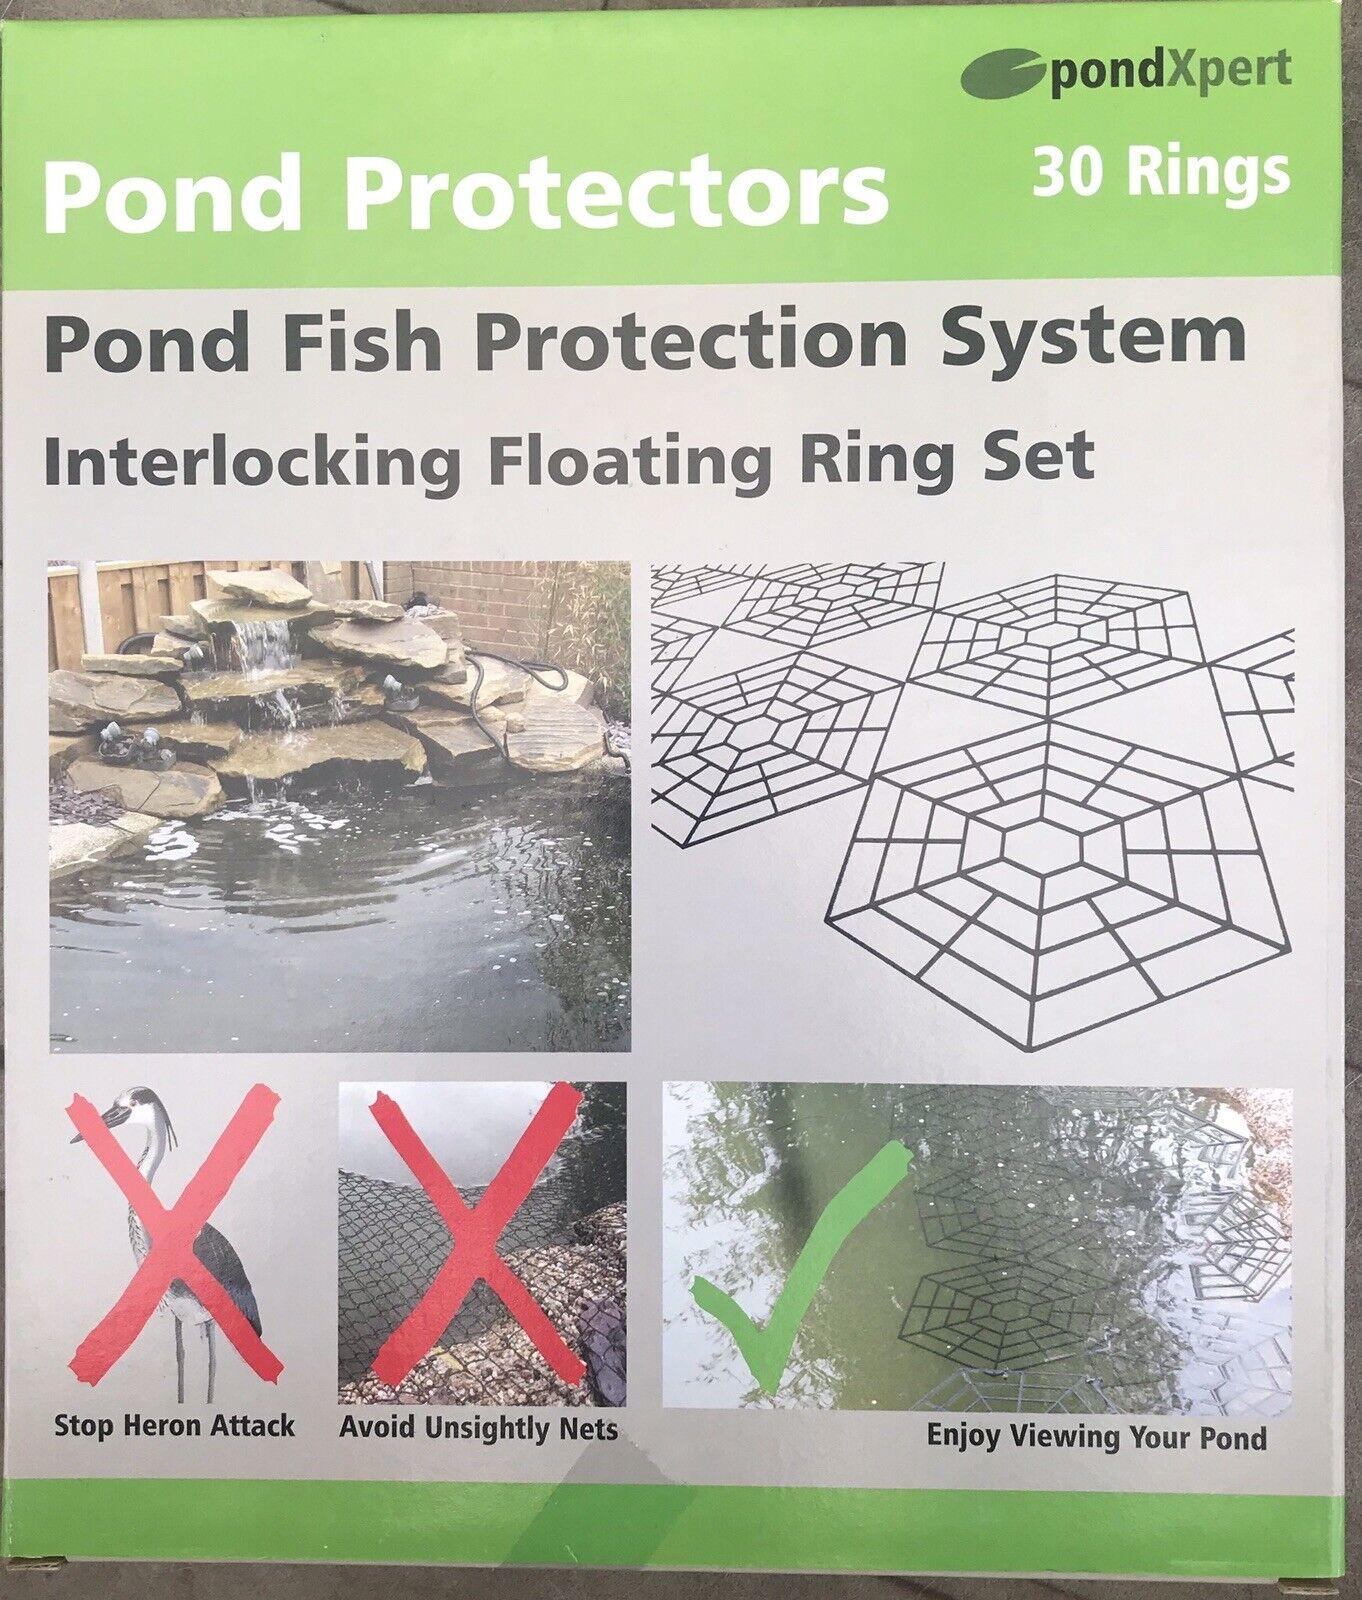 PondXpert Pond Protector Rings Protect Fish Stop Herons - Cats Fish Protectors